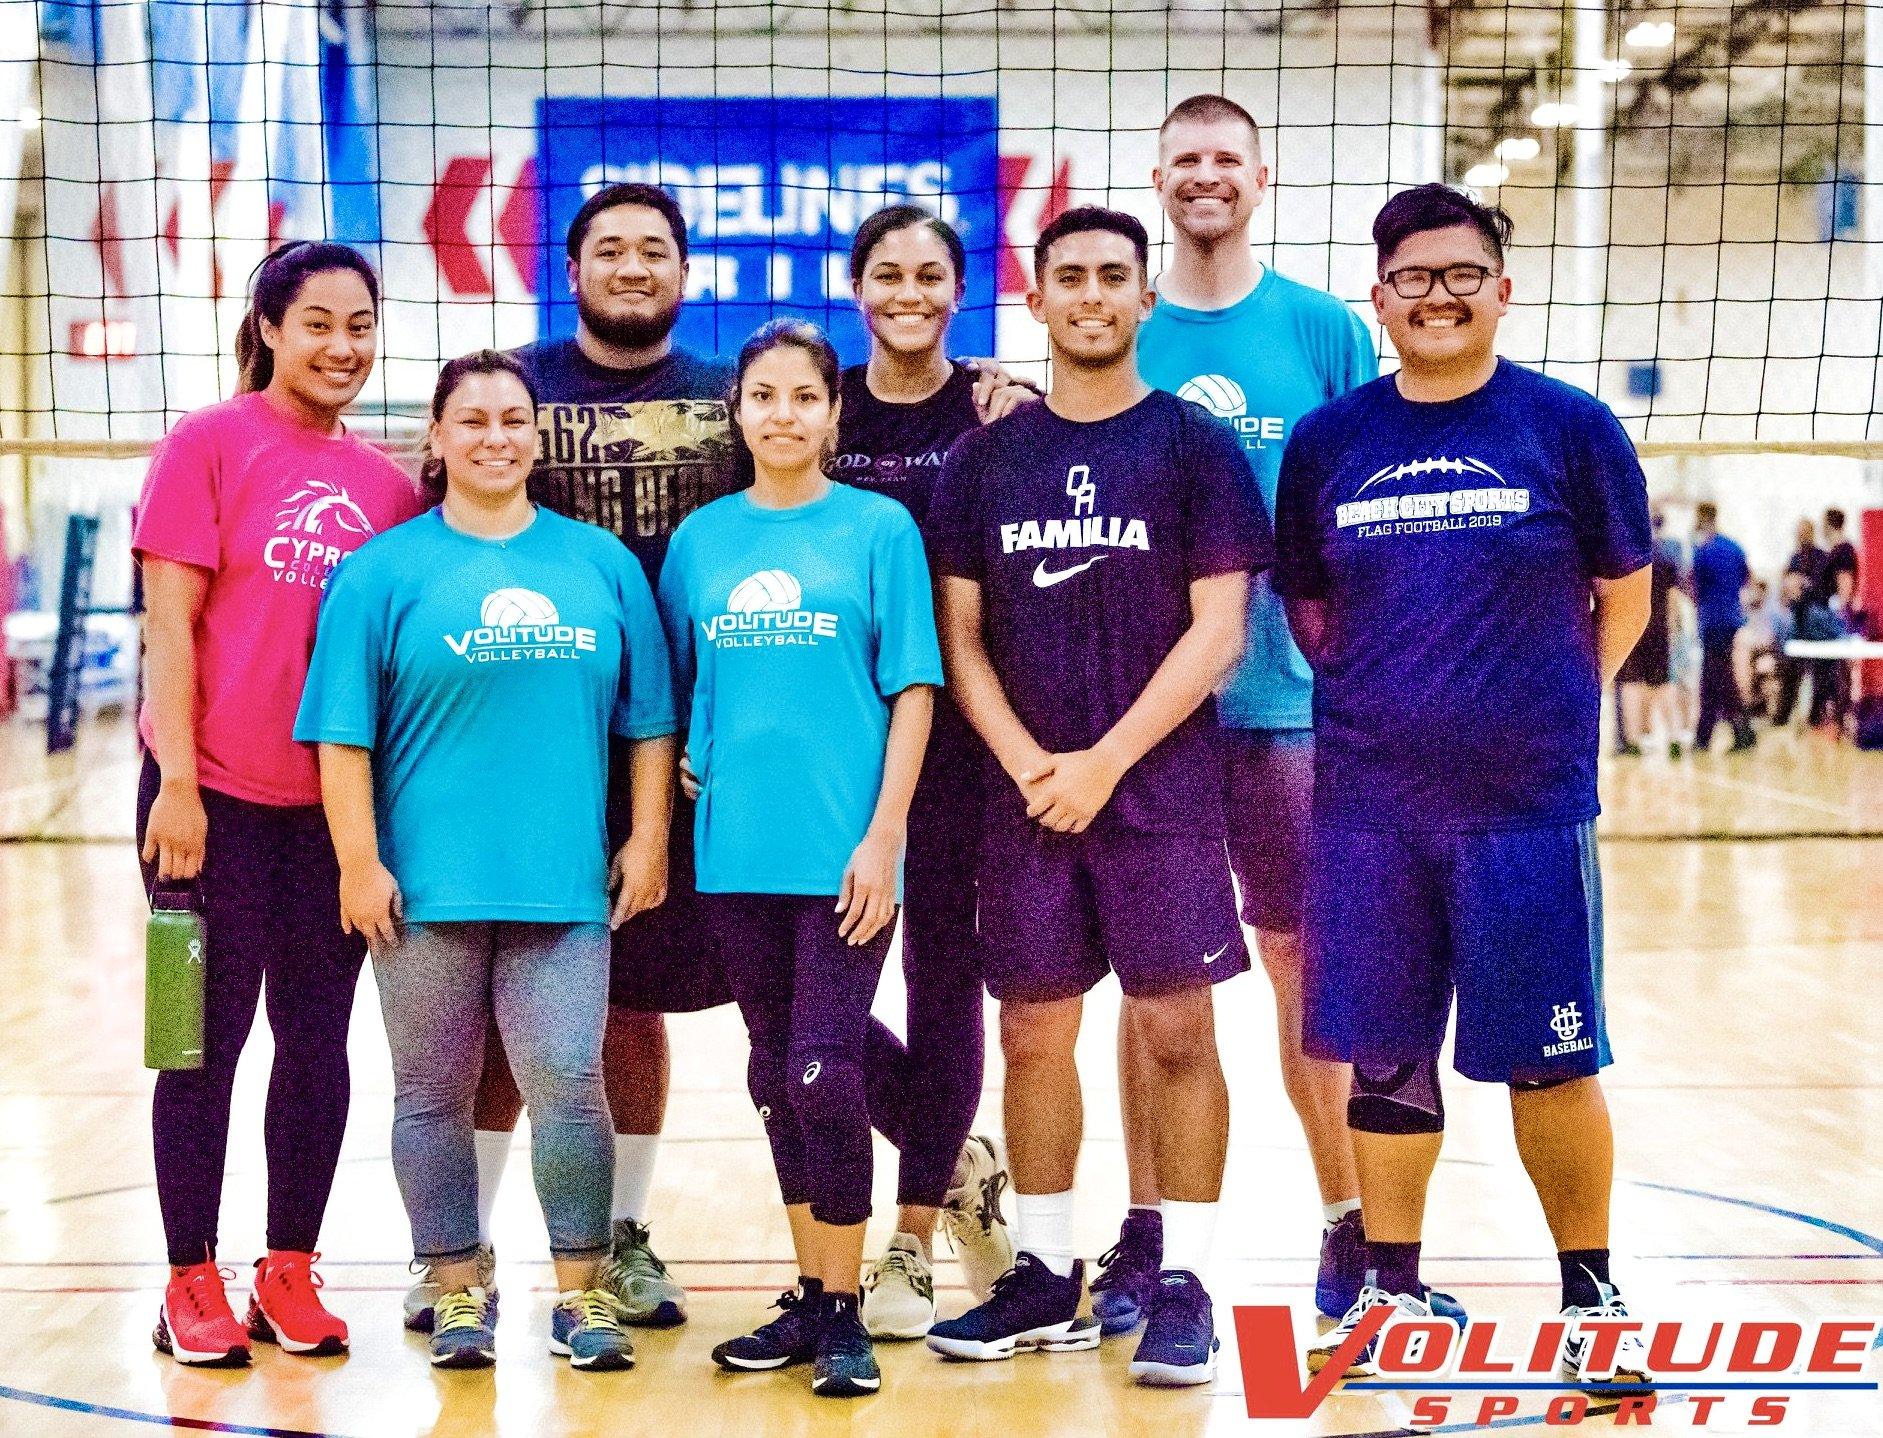 Volitude Sports Indoor Volleyball League Long Beach